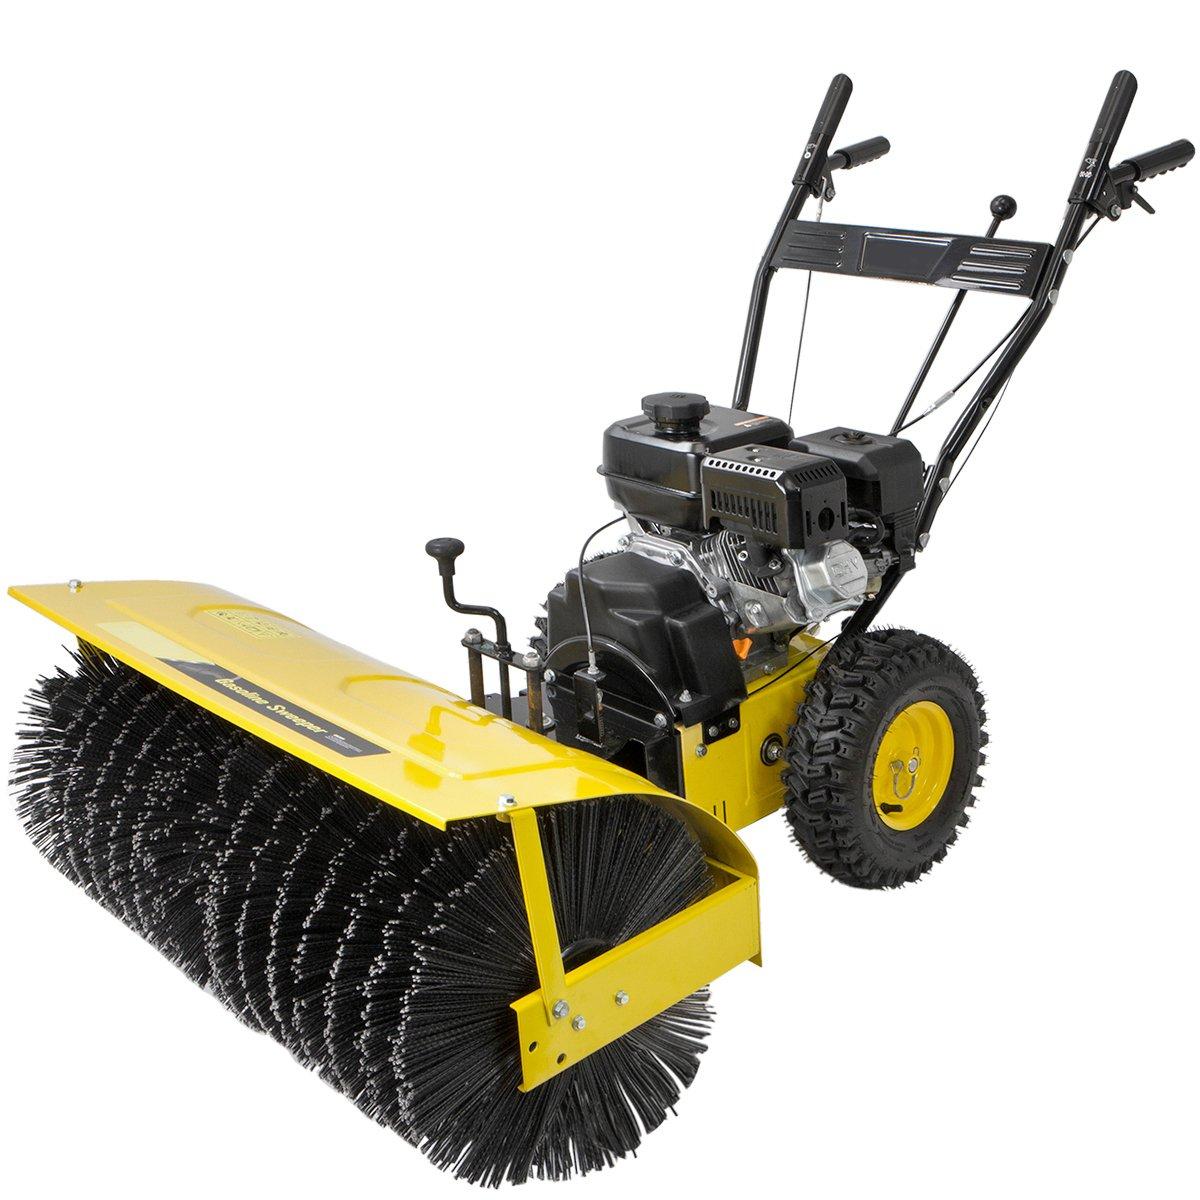 XtremepowerUS 31'' Walk Behind snow Sweeper Power Brush Broom Industrial 7hp Gas Engine